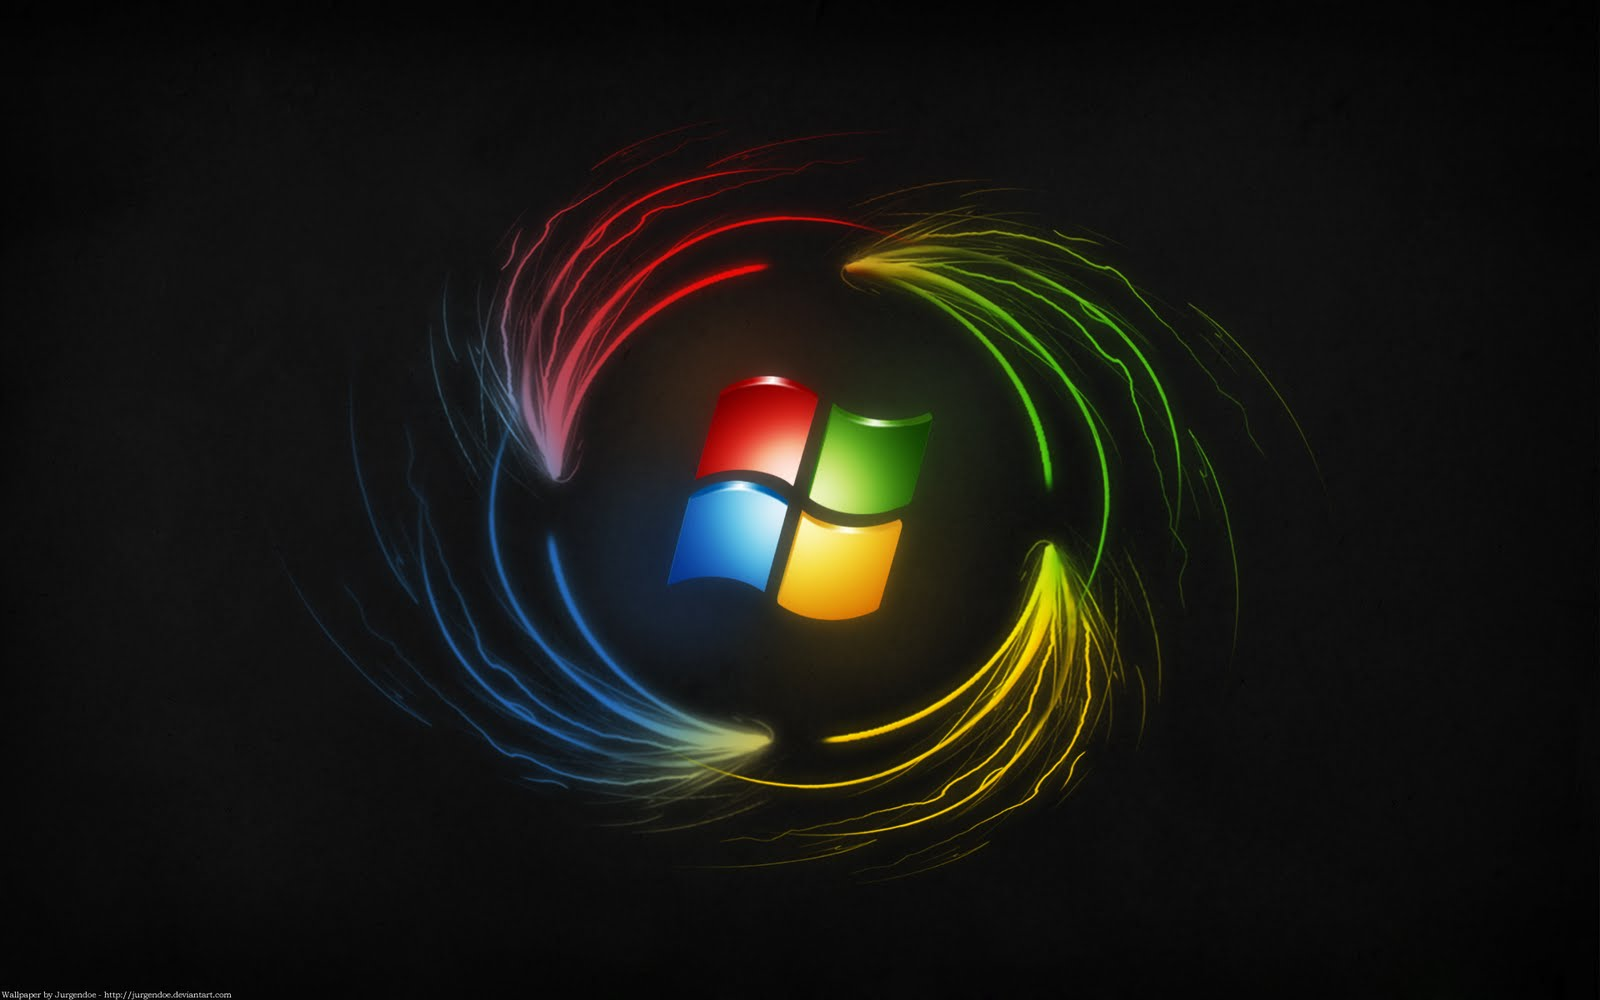 Best Windows 8 Wallpaper1 600x375 1600x1000